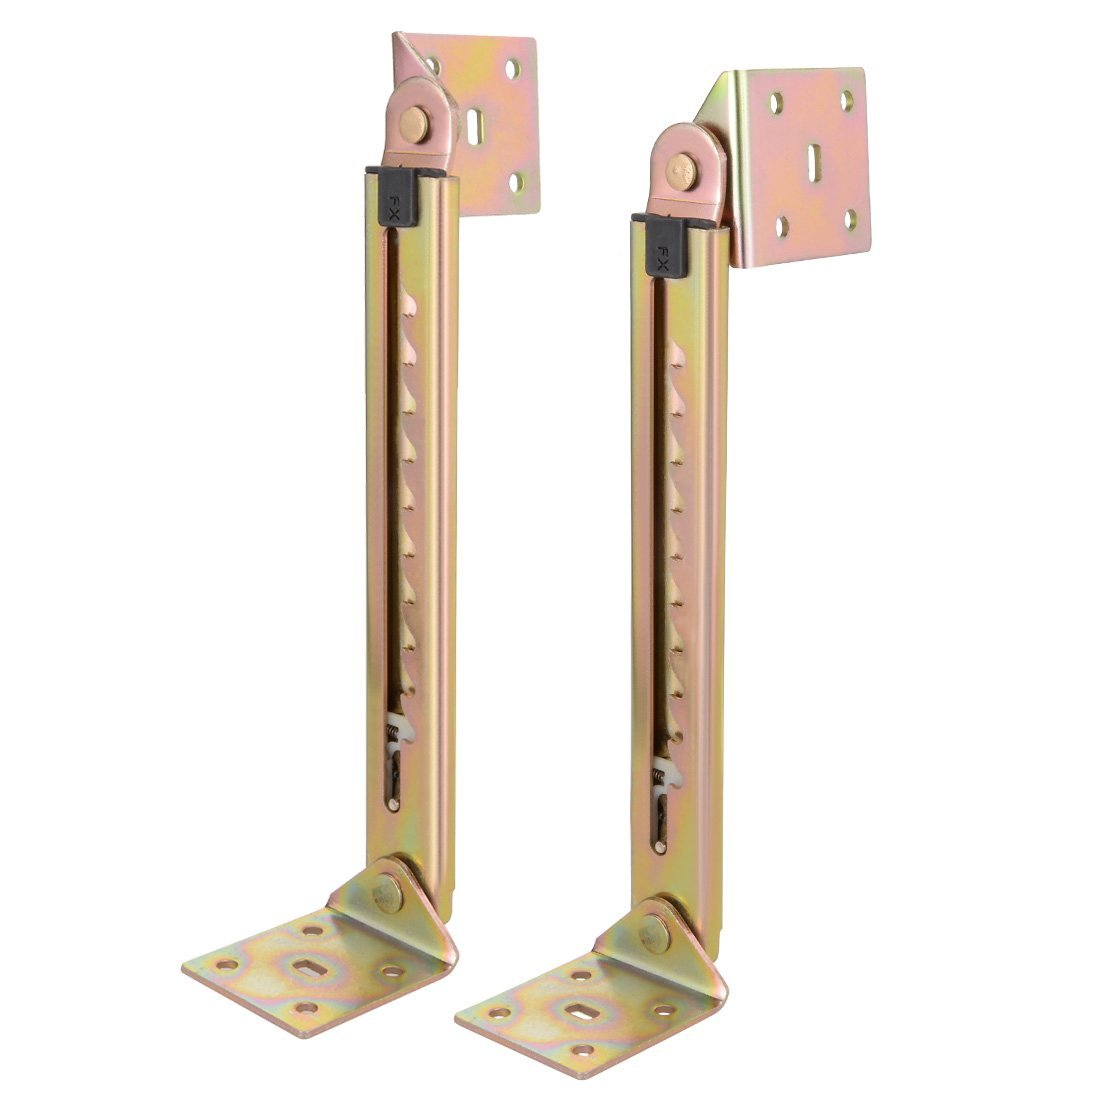 1 Pair Angle Lifting Rod Desk 10 Gear Adjusting Hinge Angle Hinge With Bracket Dropshipping